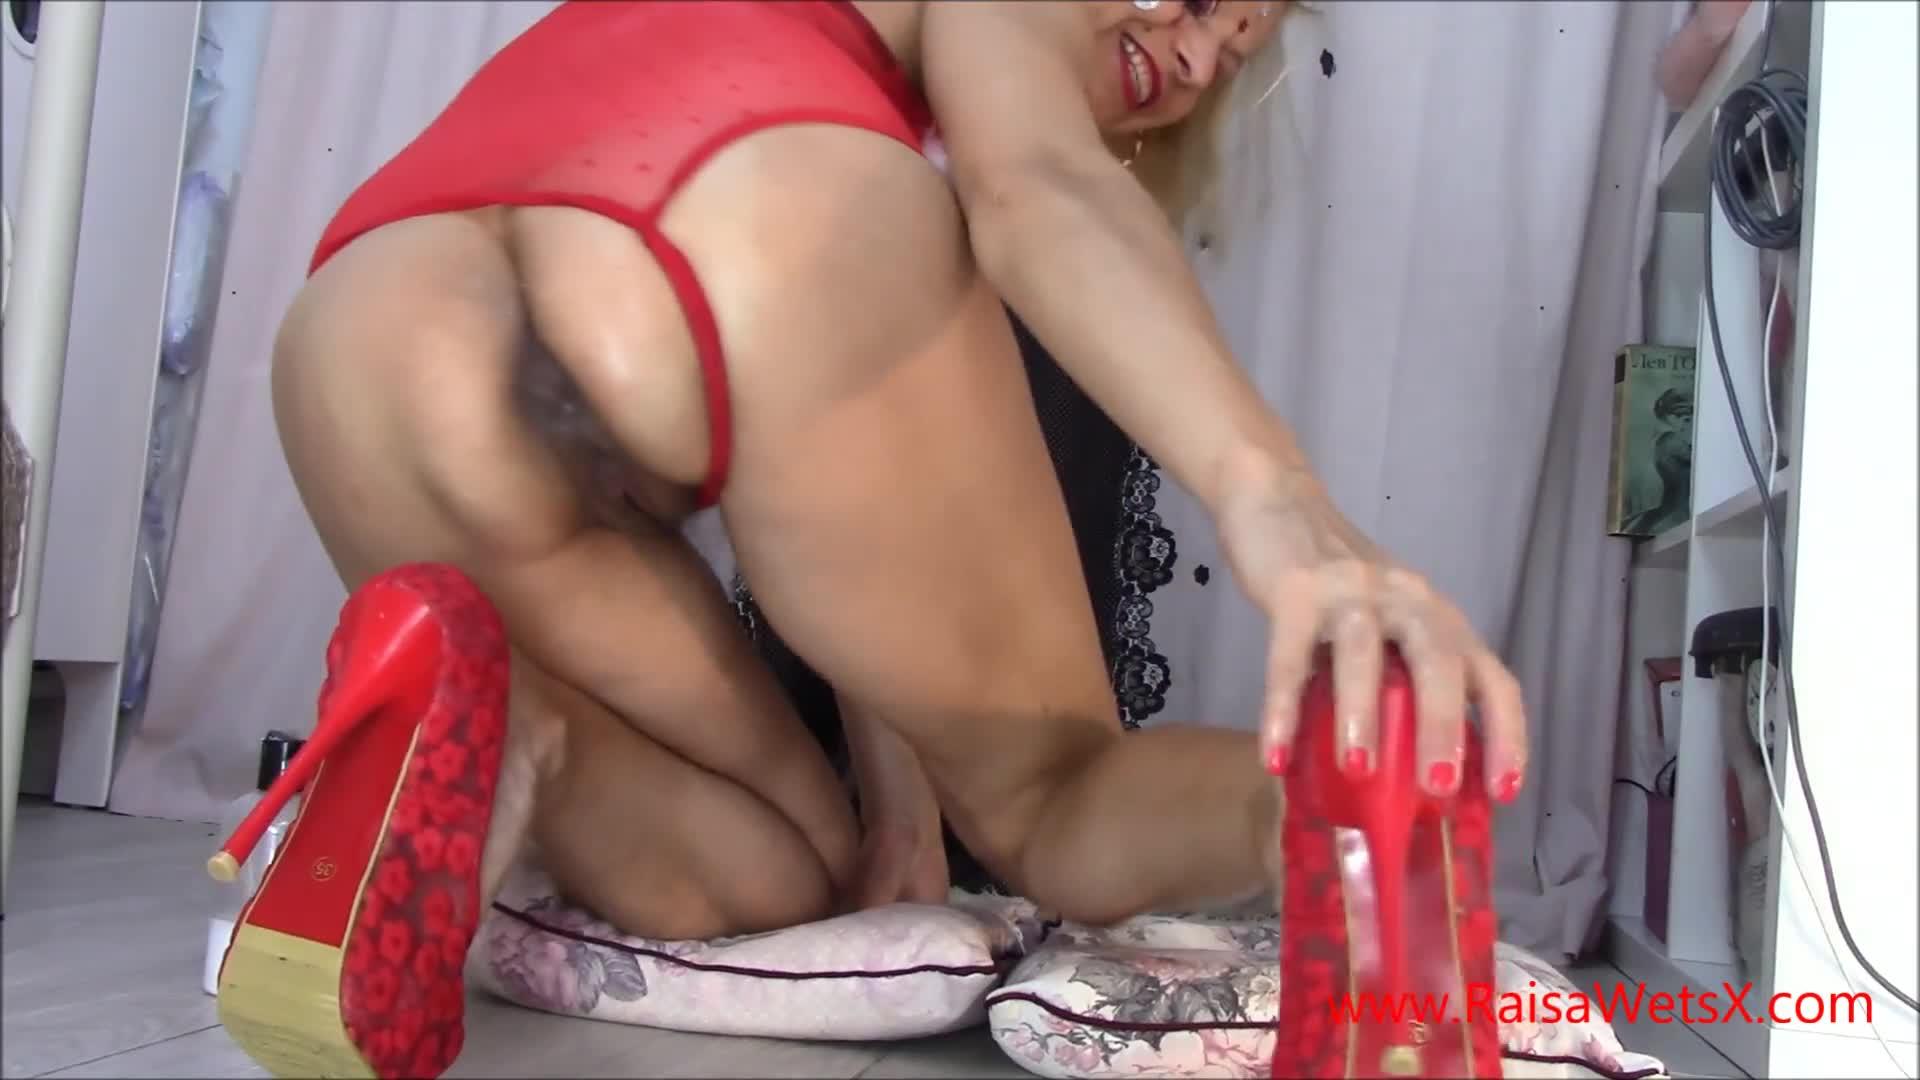 Raisa wetsx porn